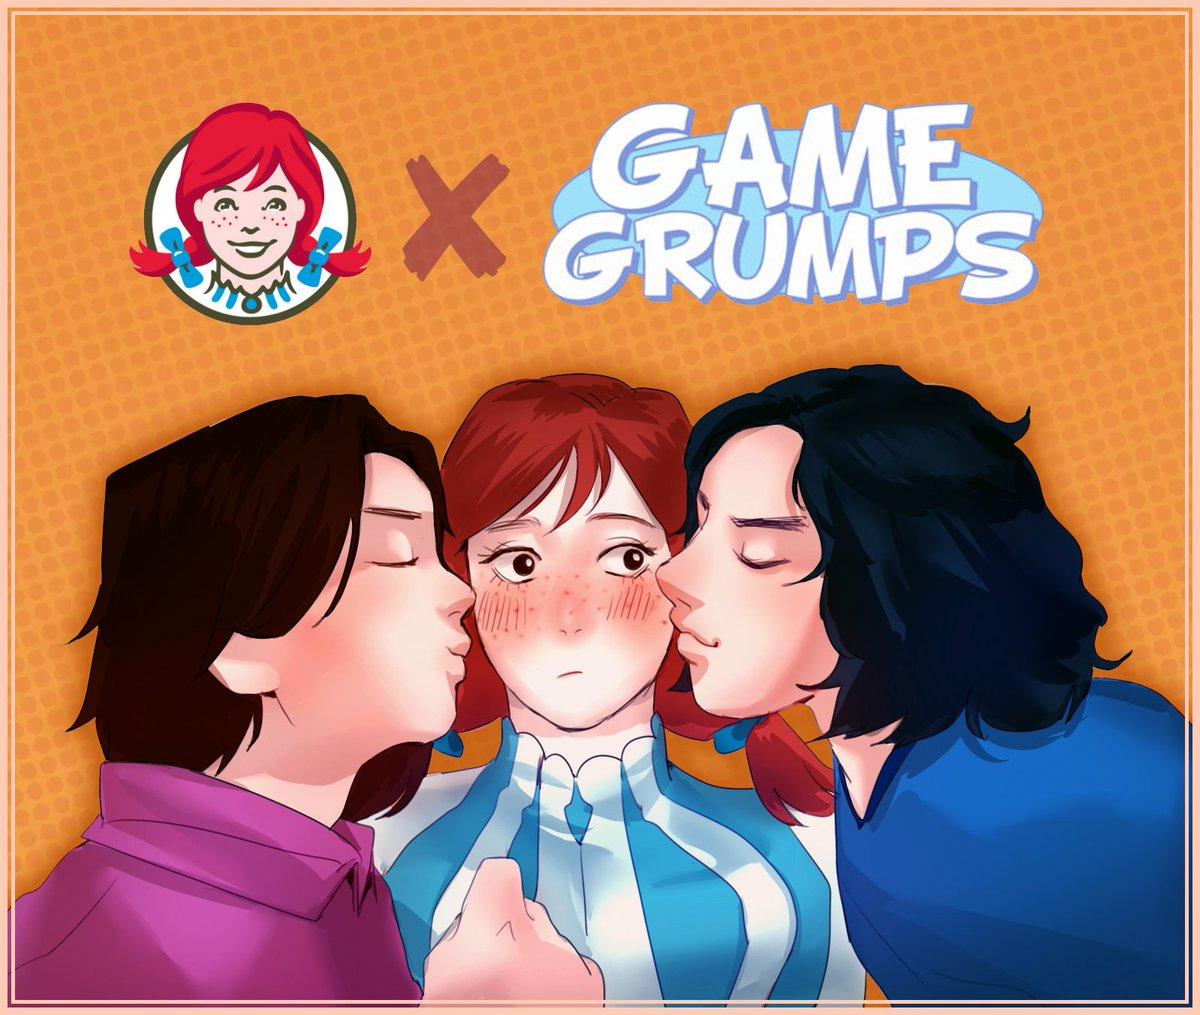 Game grumps fan art dawn